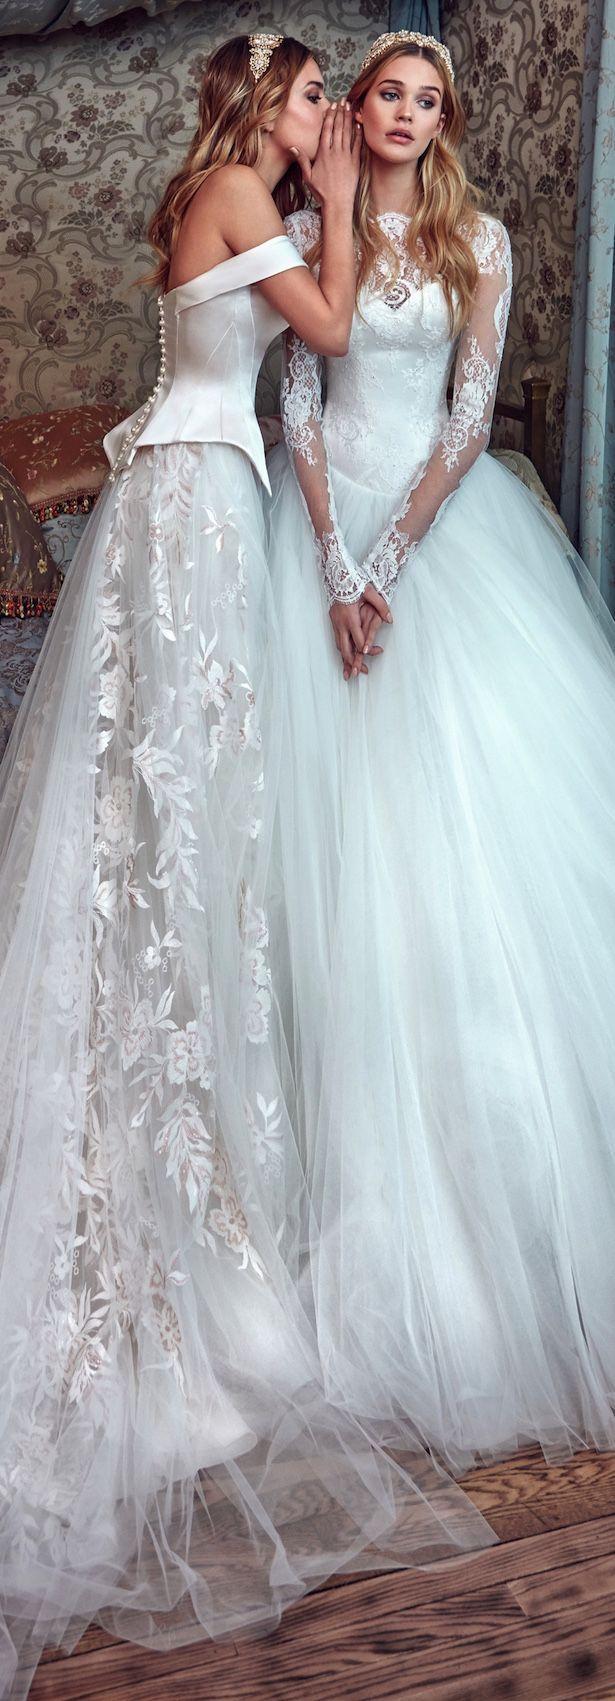 Galia Lahav Spring 2017 Collection - Le Secret Royal